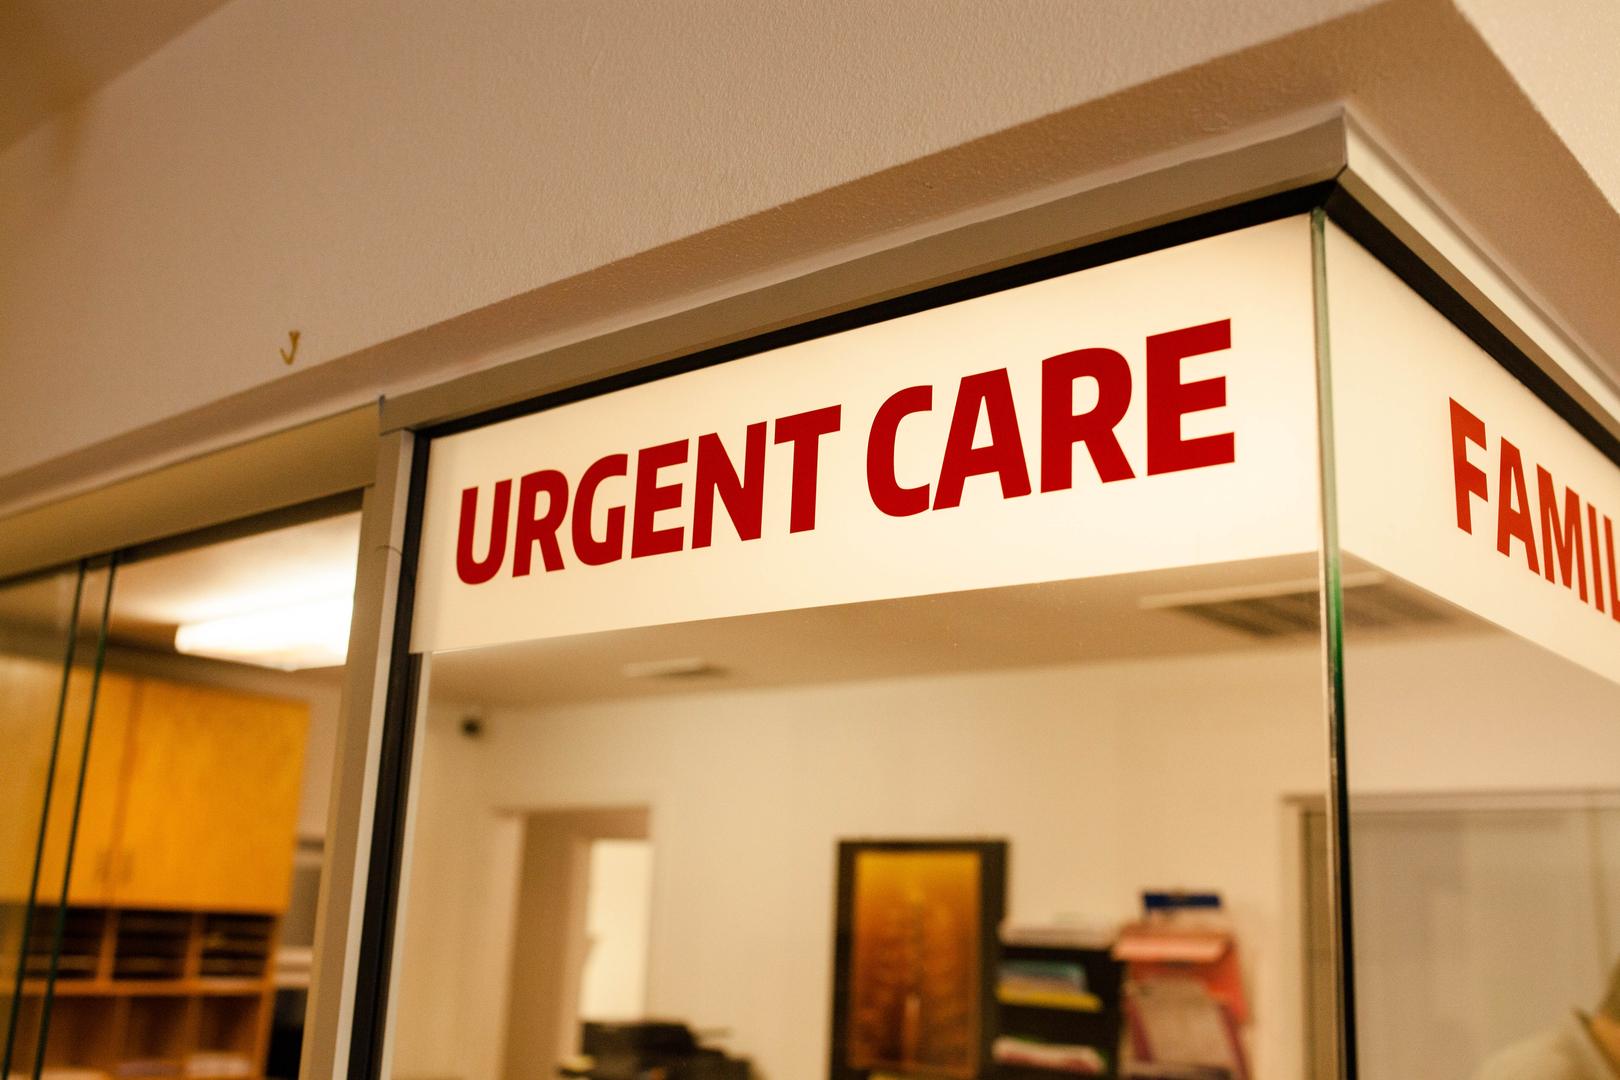 Family Practice Urgent Care Churn Creek Healthcare Redding Ca